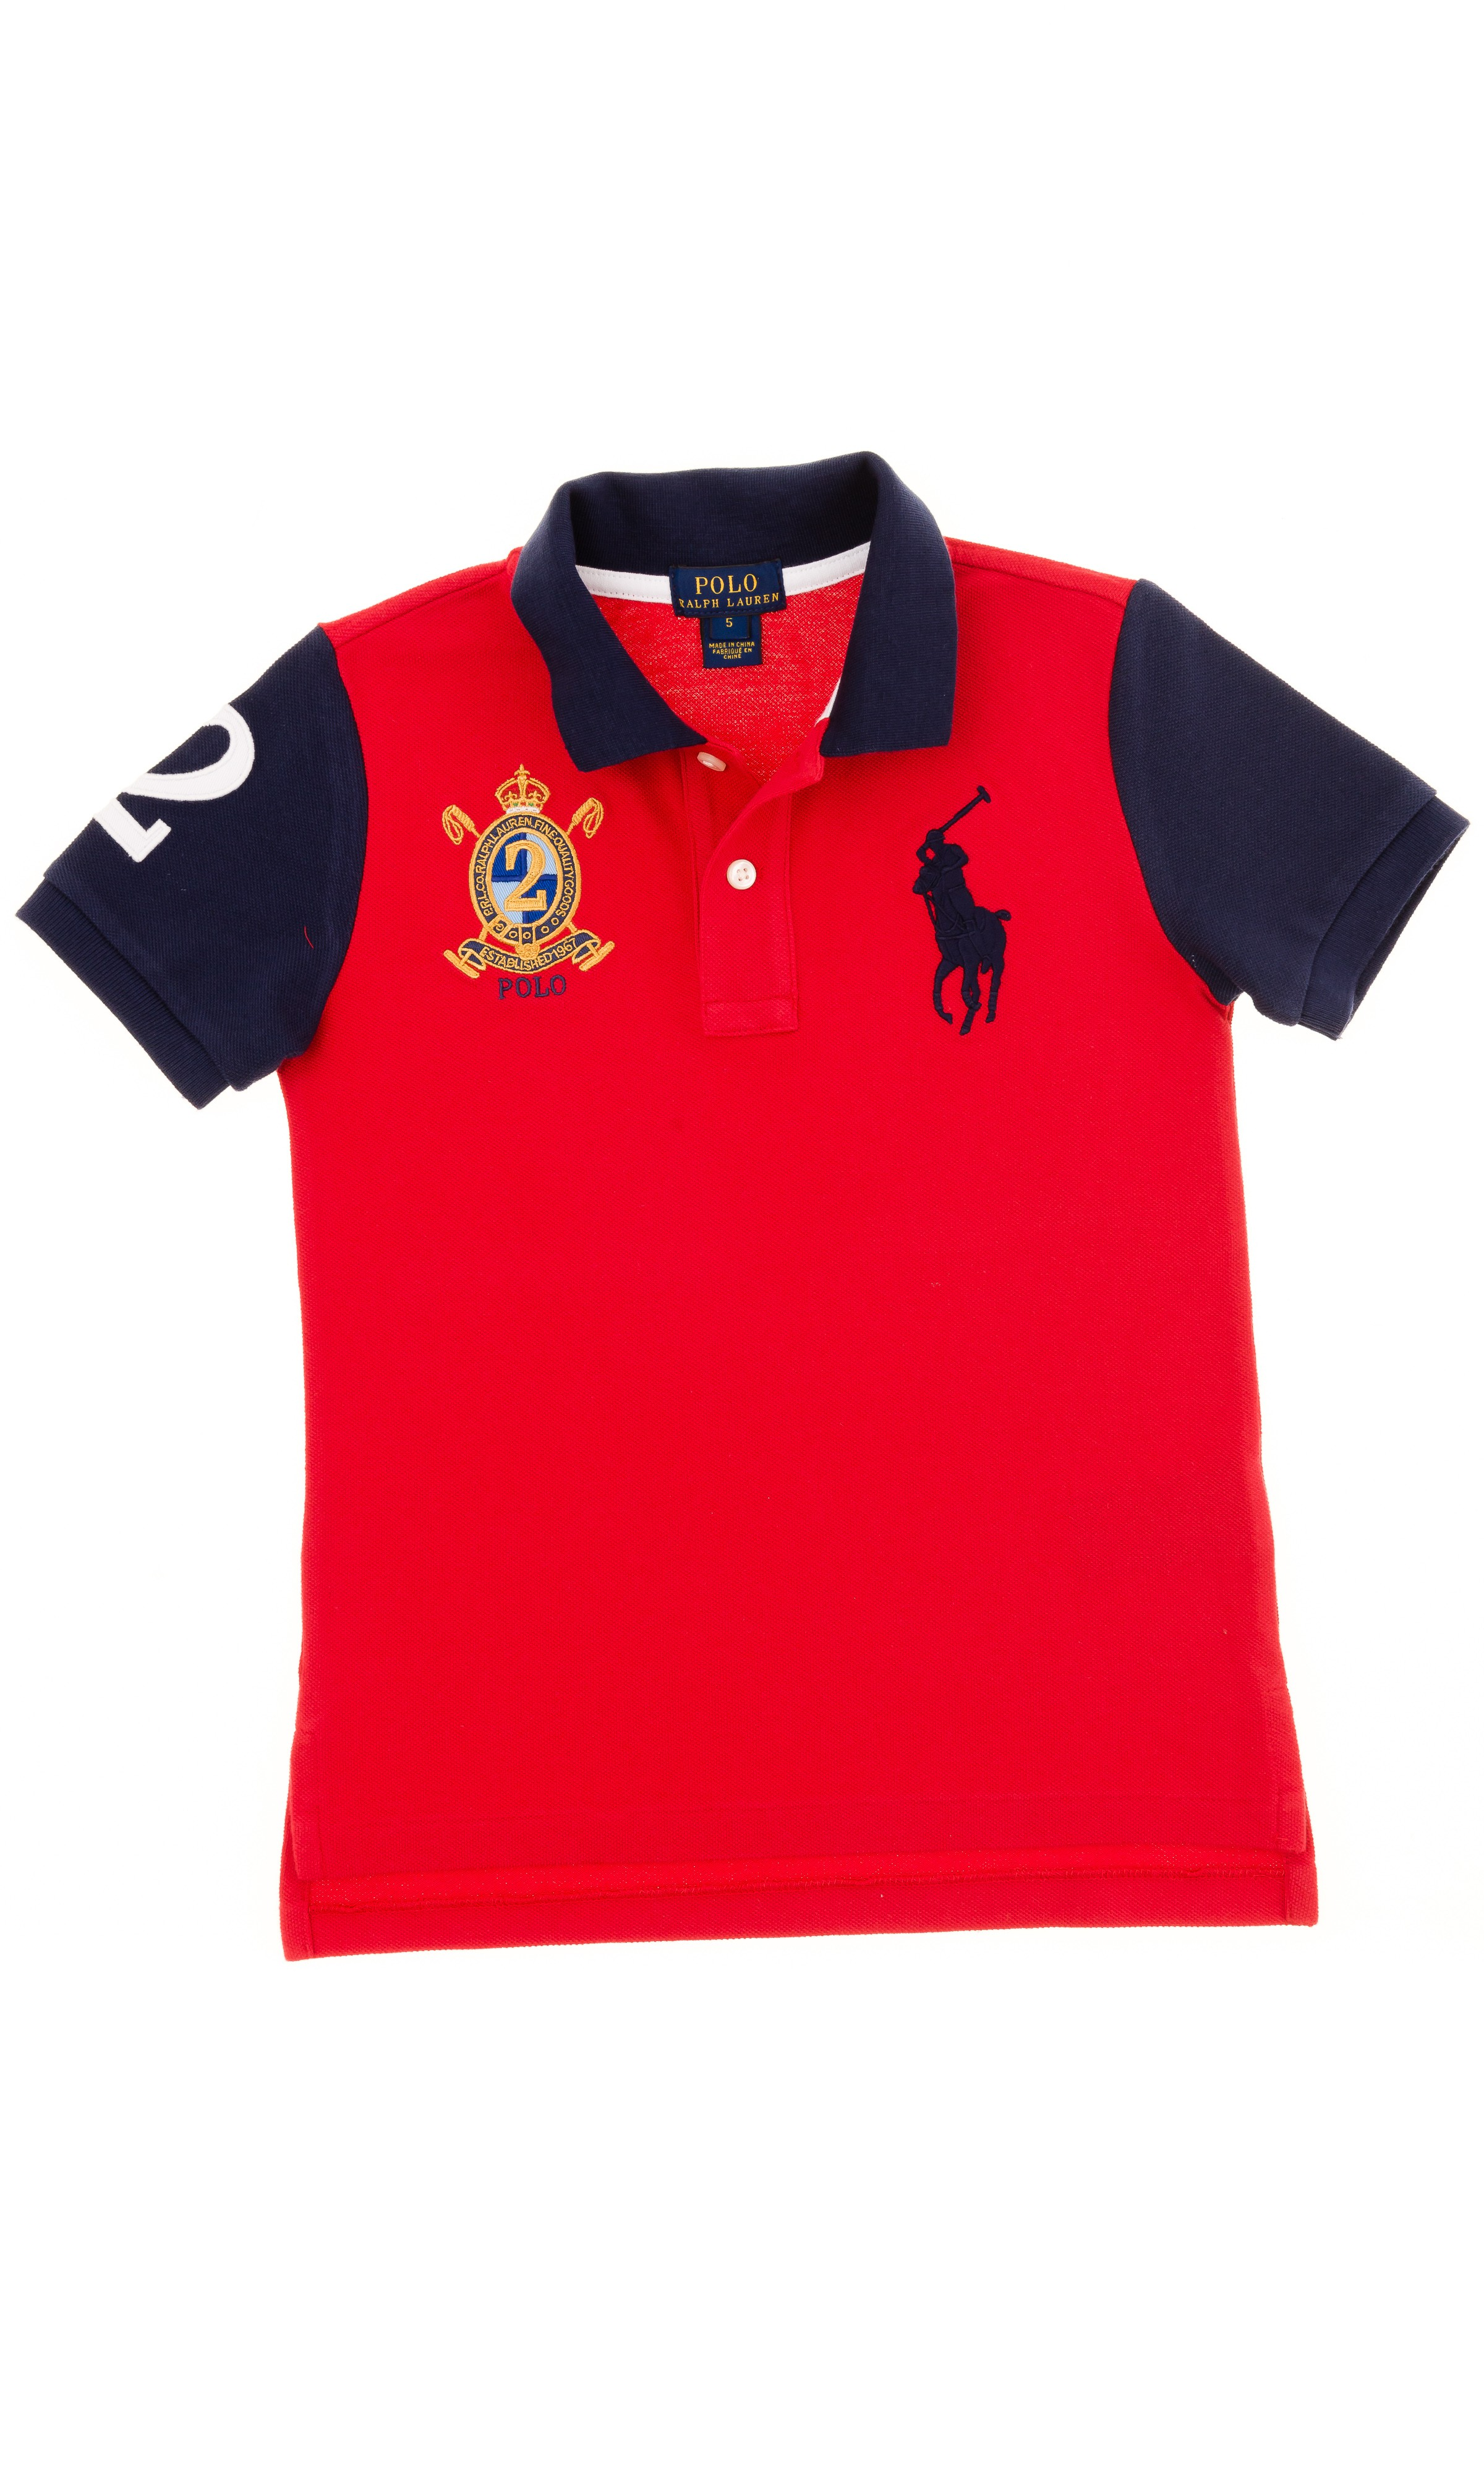 Red boy polo shirt polo ralph lauren celebrity club for Ralph lauren polo club shirts